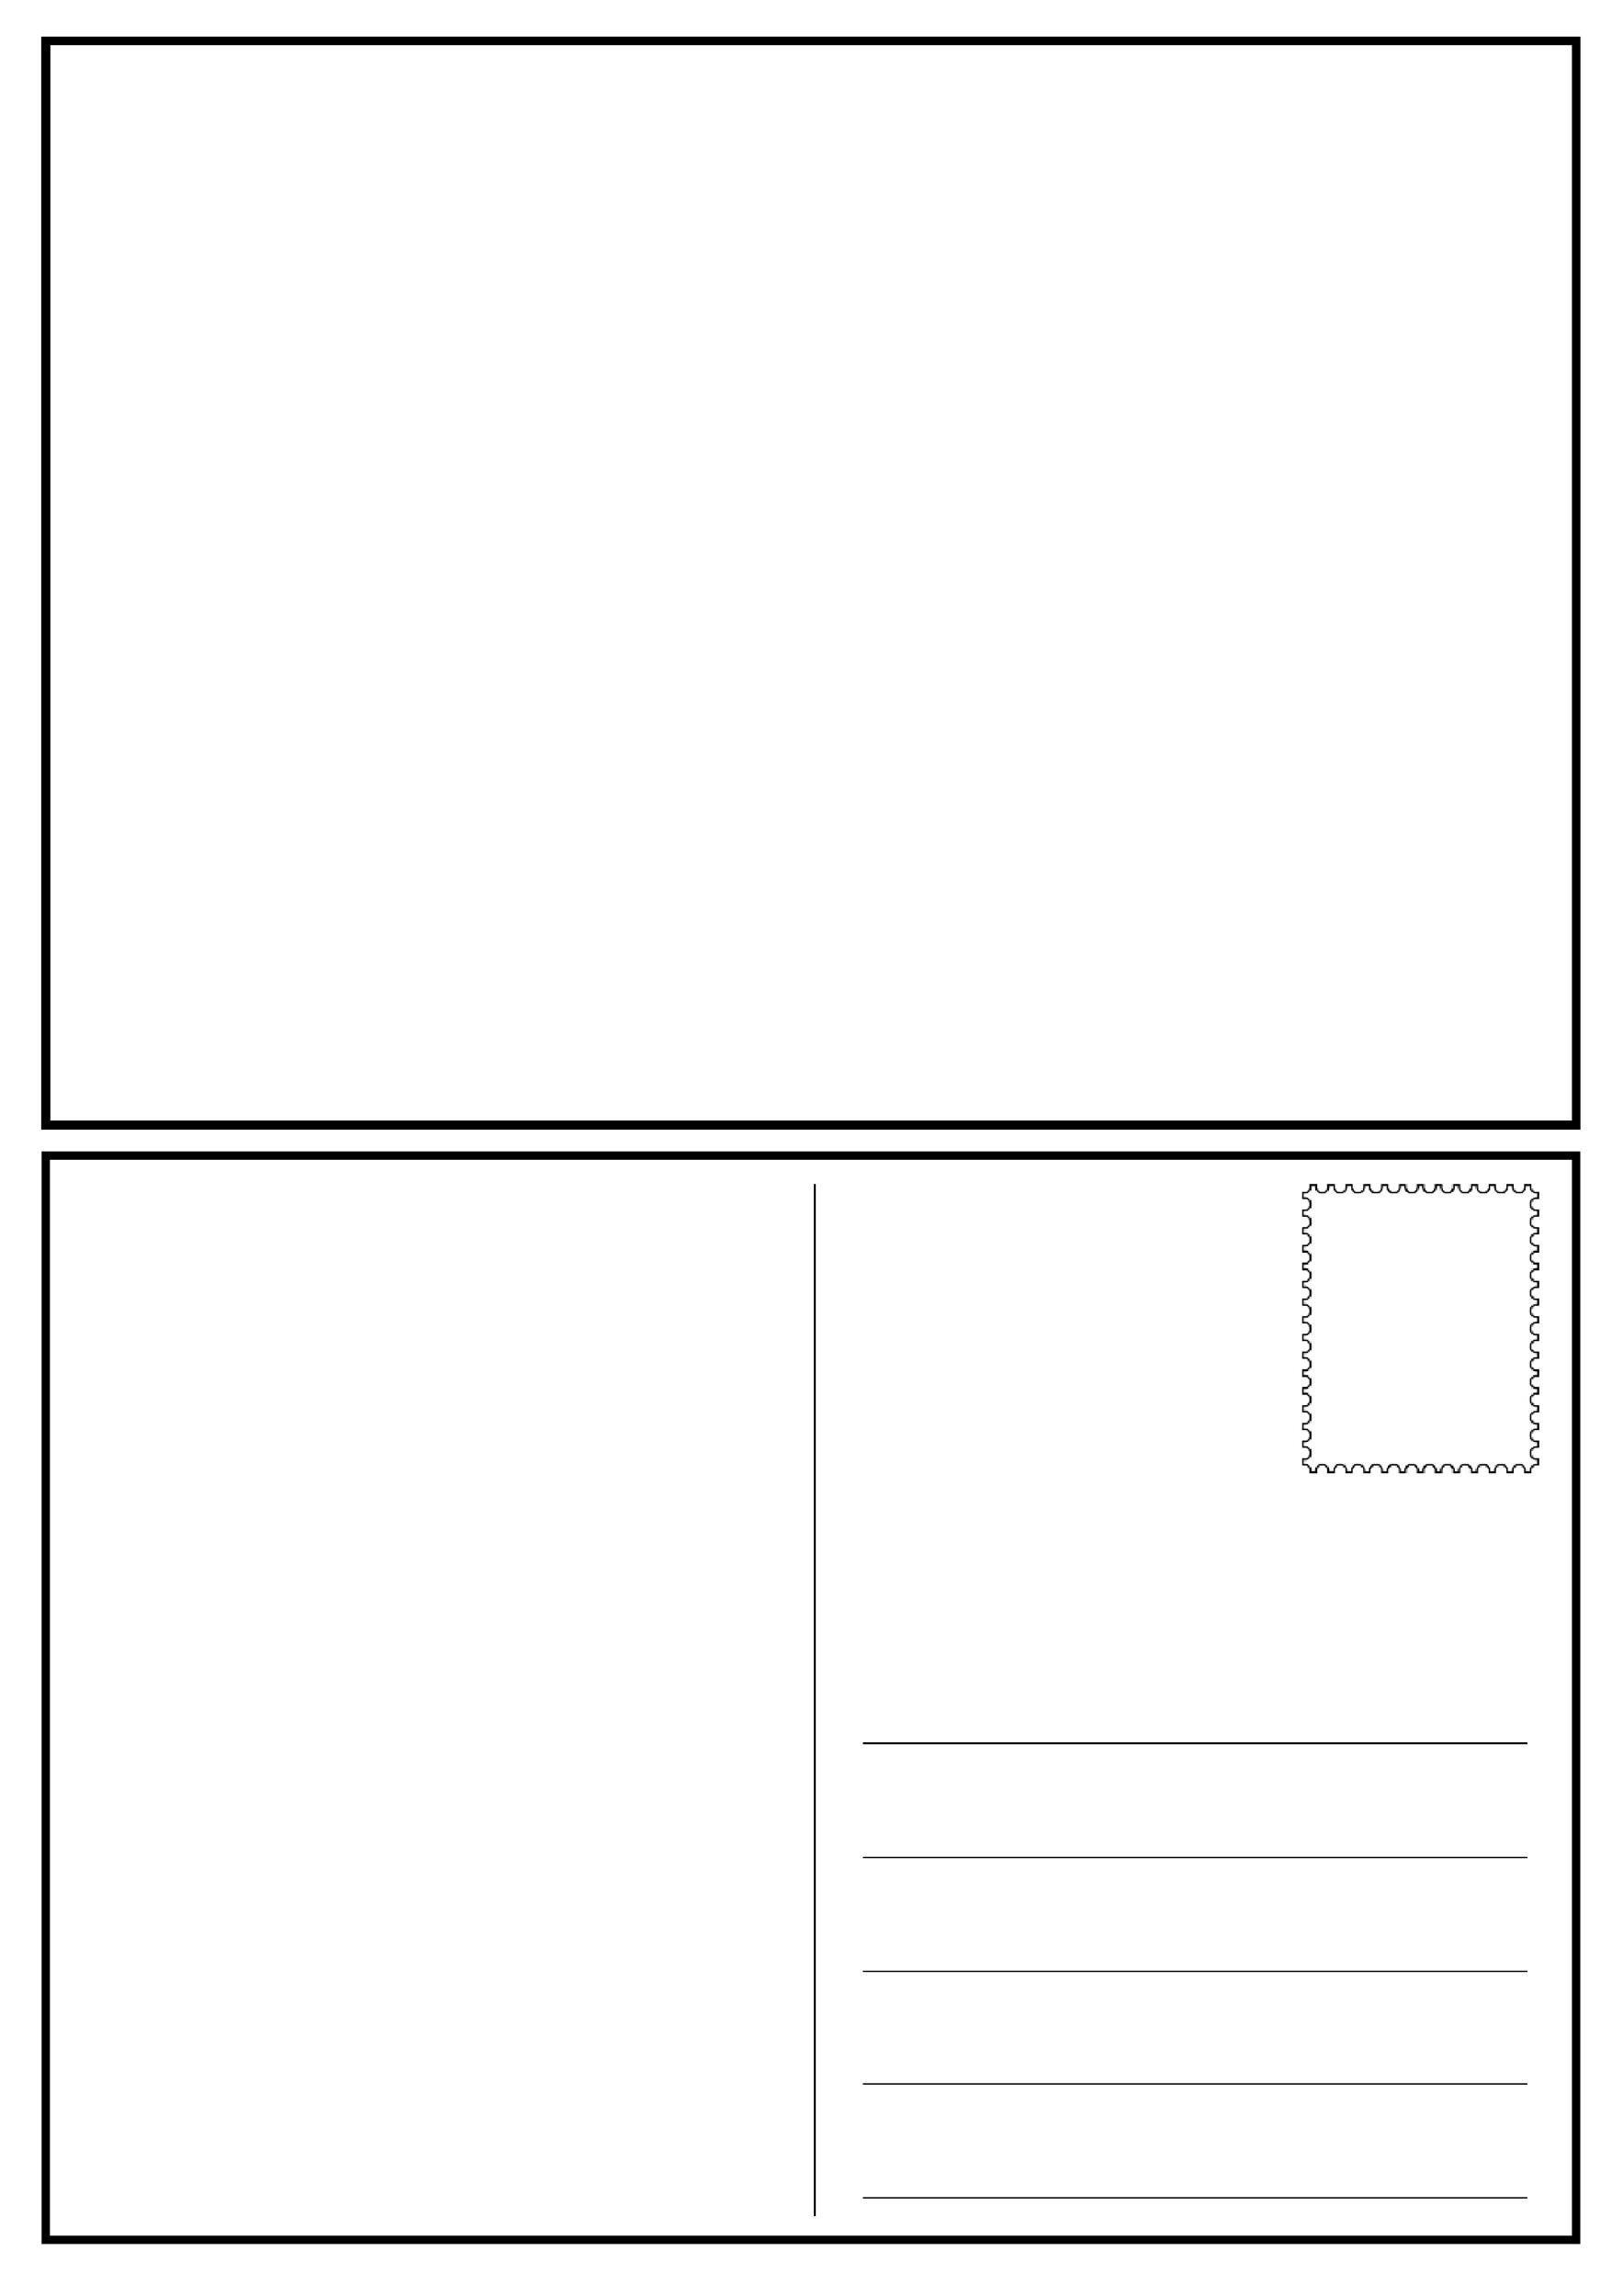 008 Impressive Postcard Layout For Microsoft Word Idea  4 TemplateFull